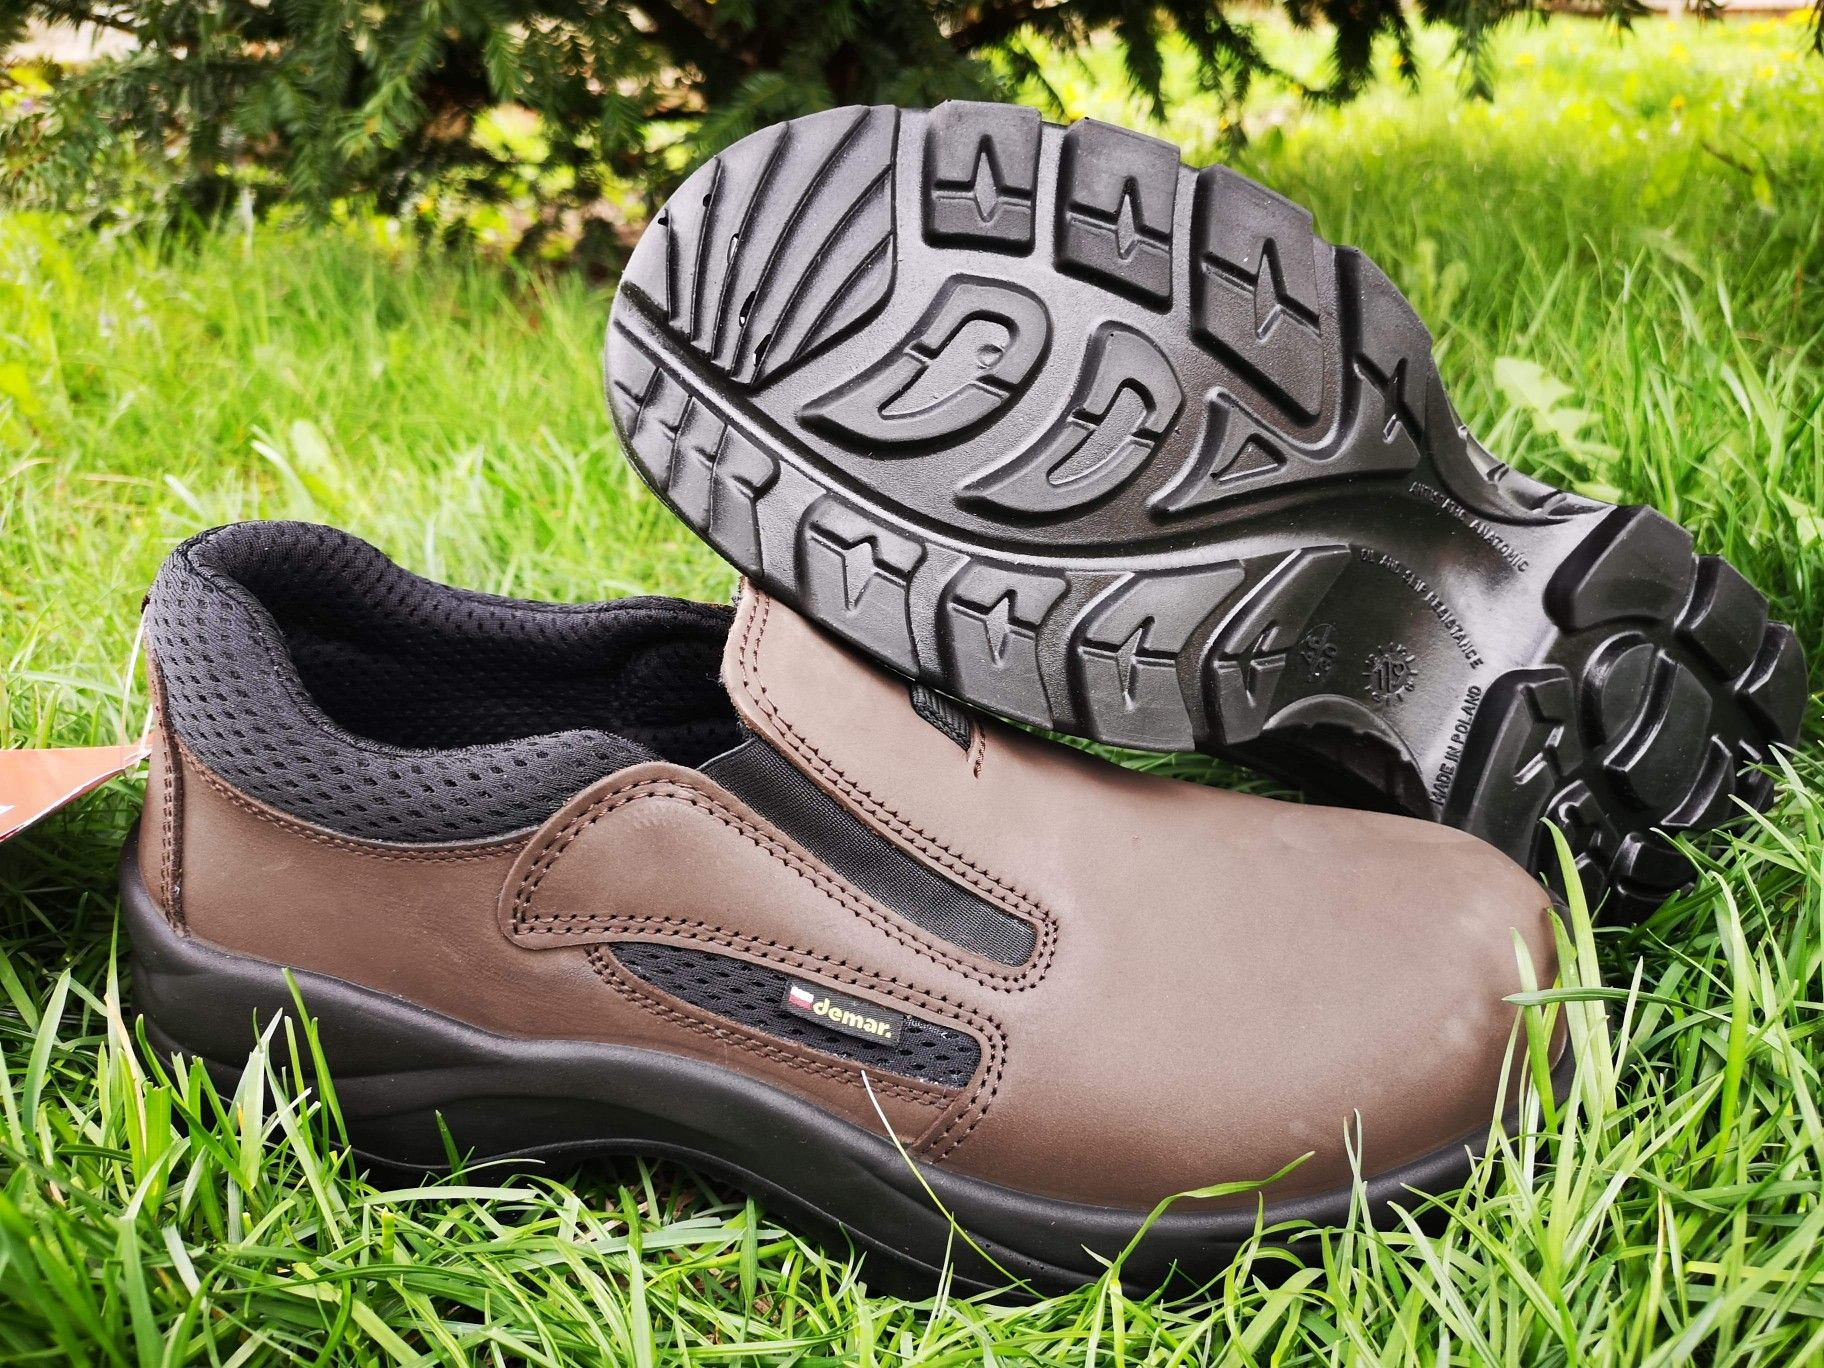 Polbuty Mysliwskie Rest D1 Shoes Clogs Dansko Professional Clog